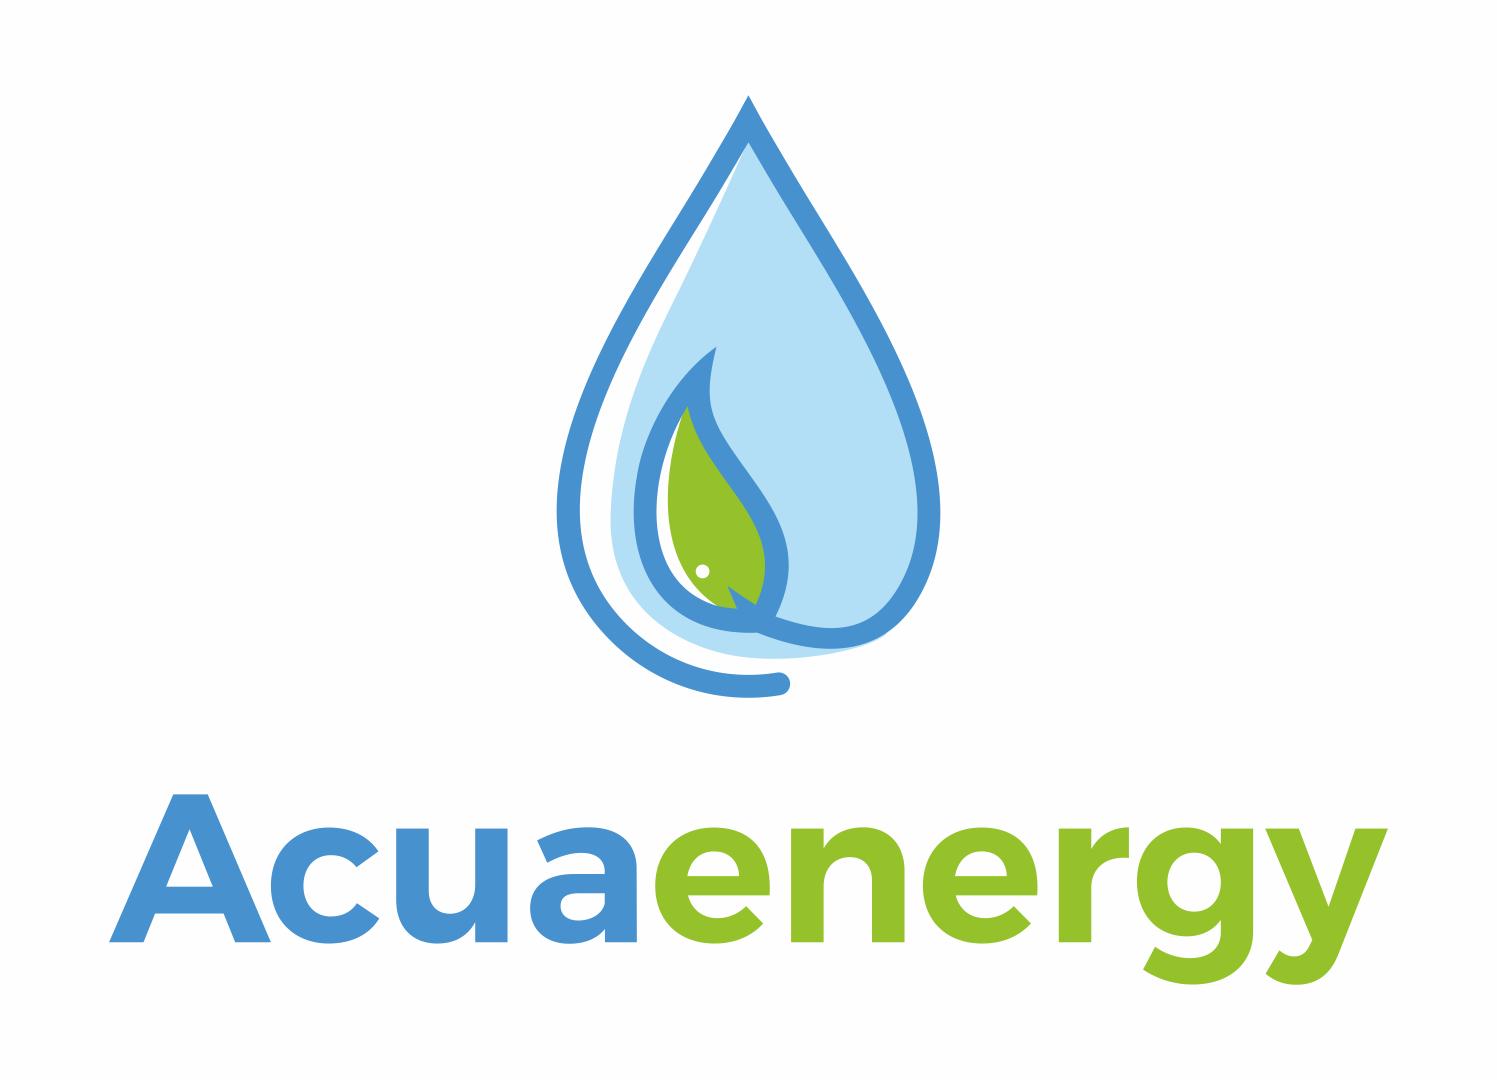 Acuaenergy - Logotipo